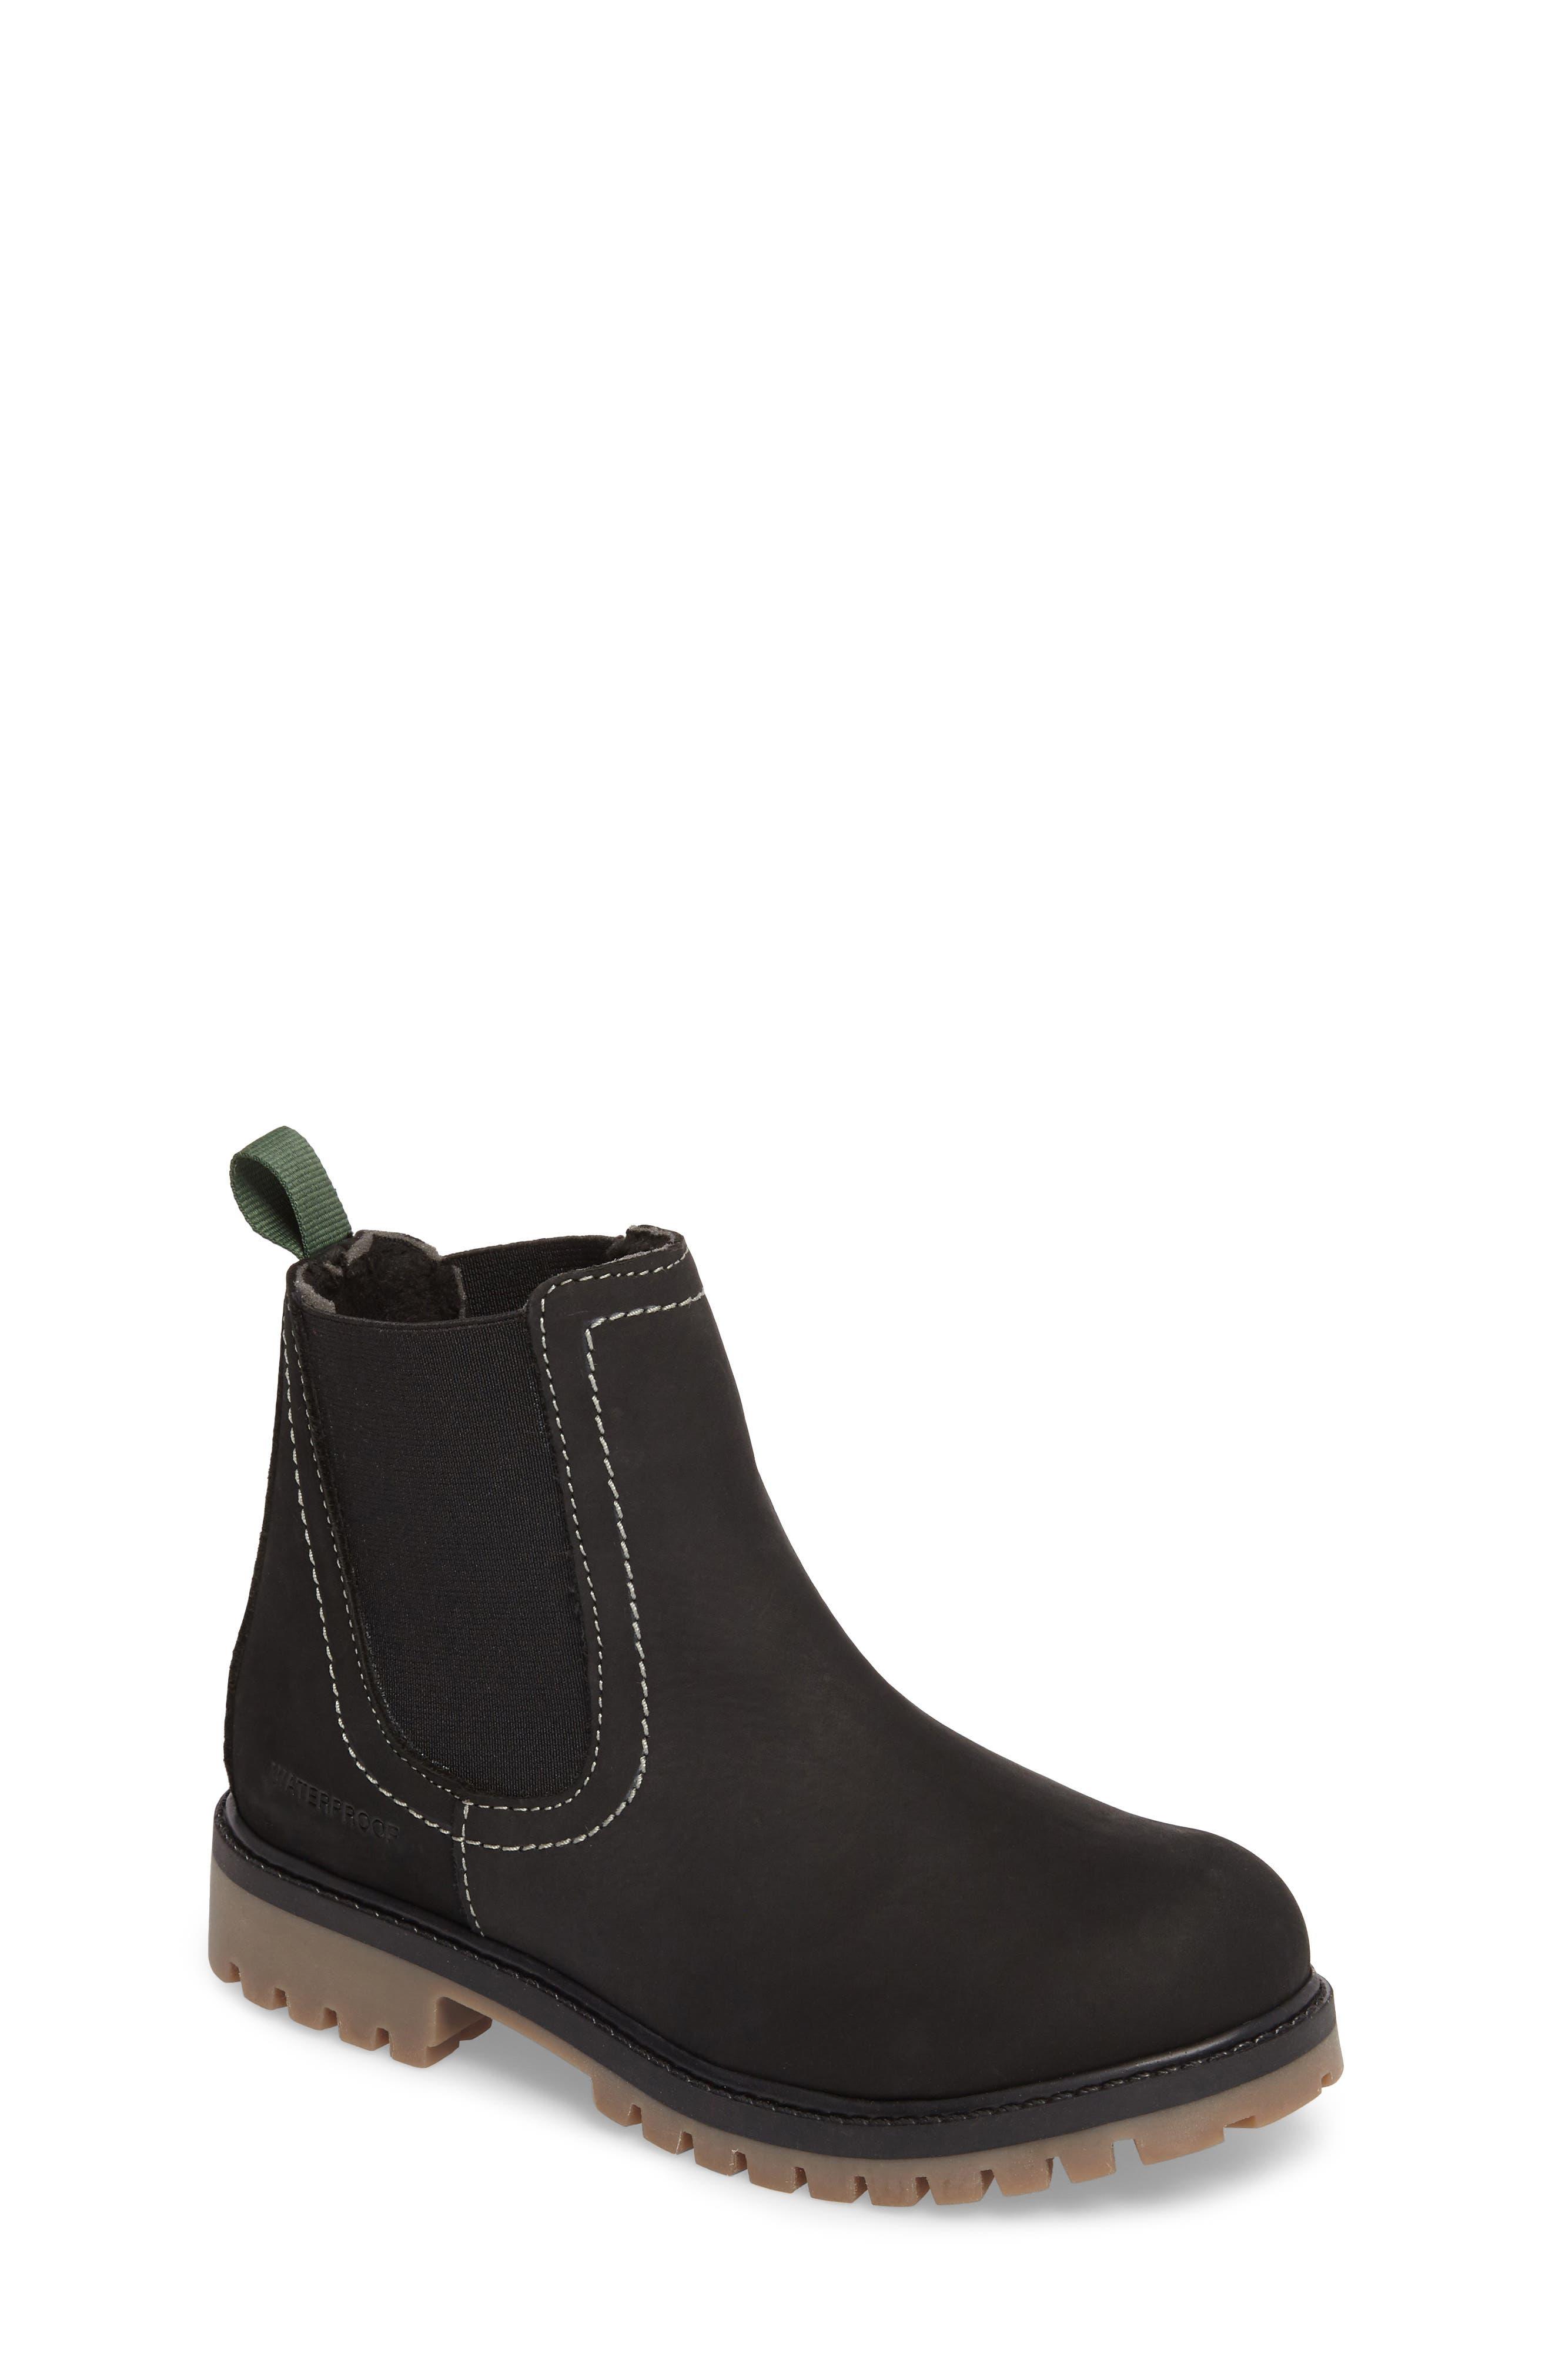 TakodaC Waterproof Chelsea Boot,                             Main thumbnail 1, color,                             Black